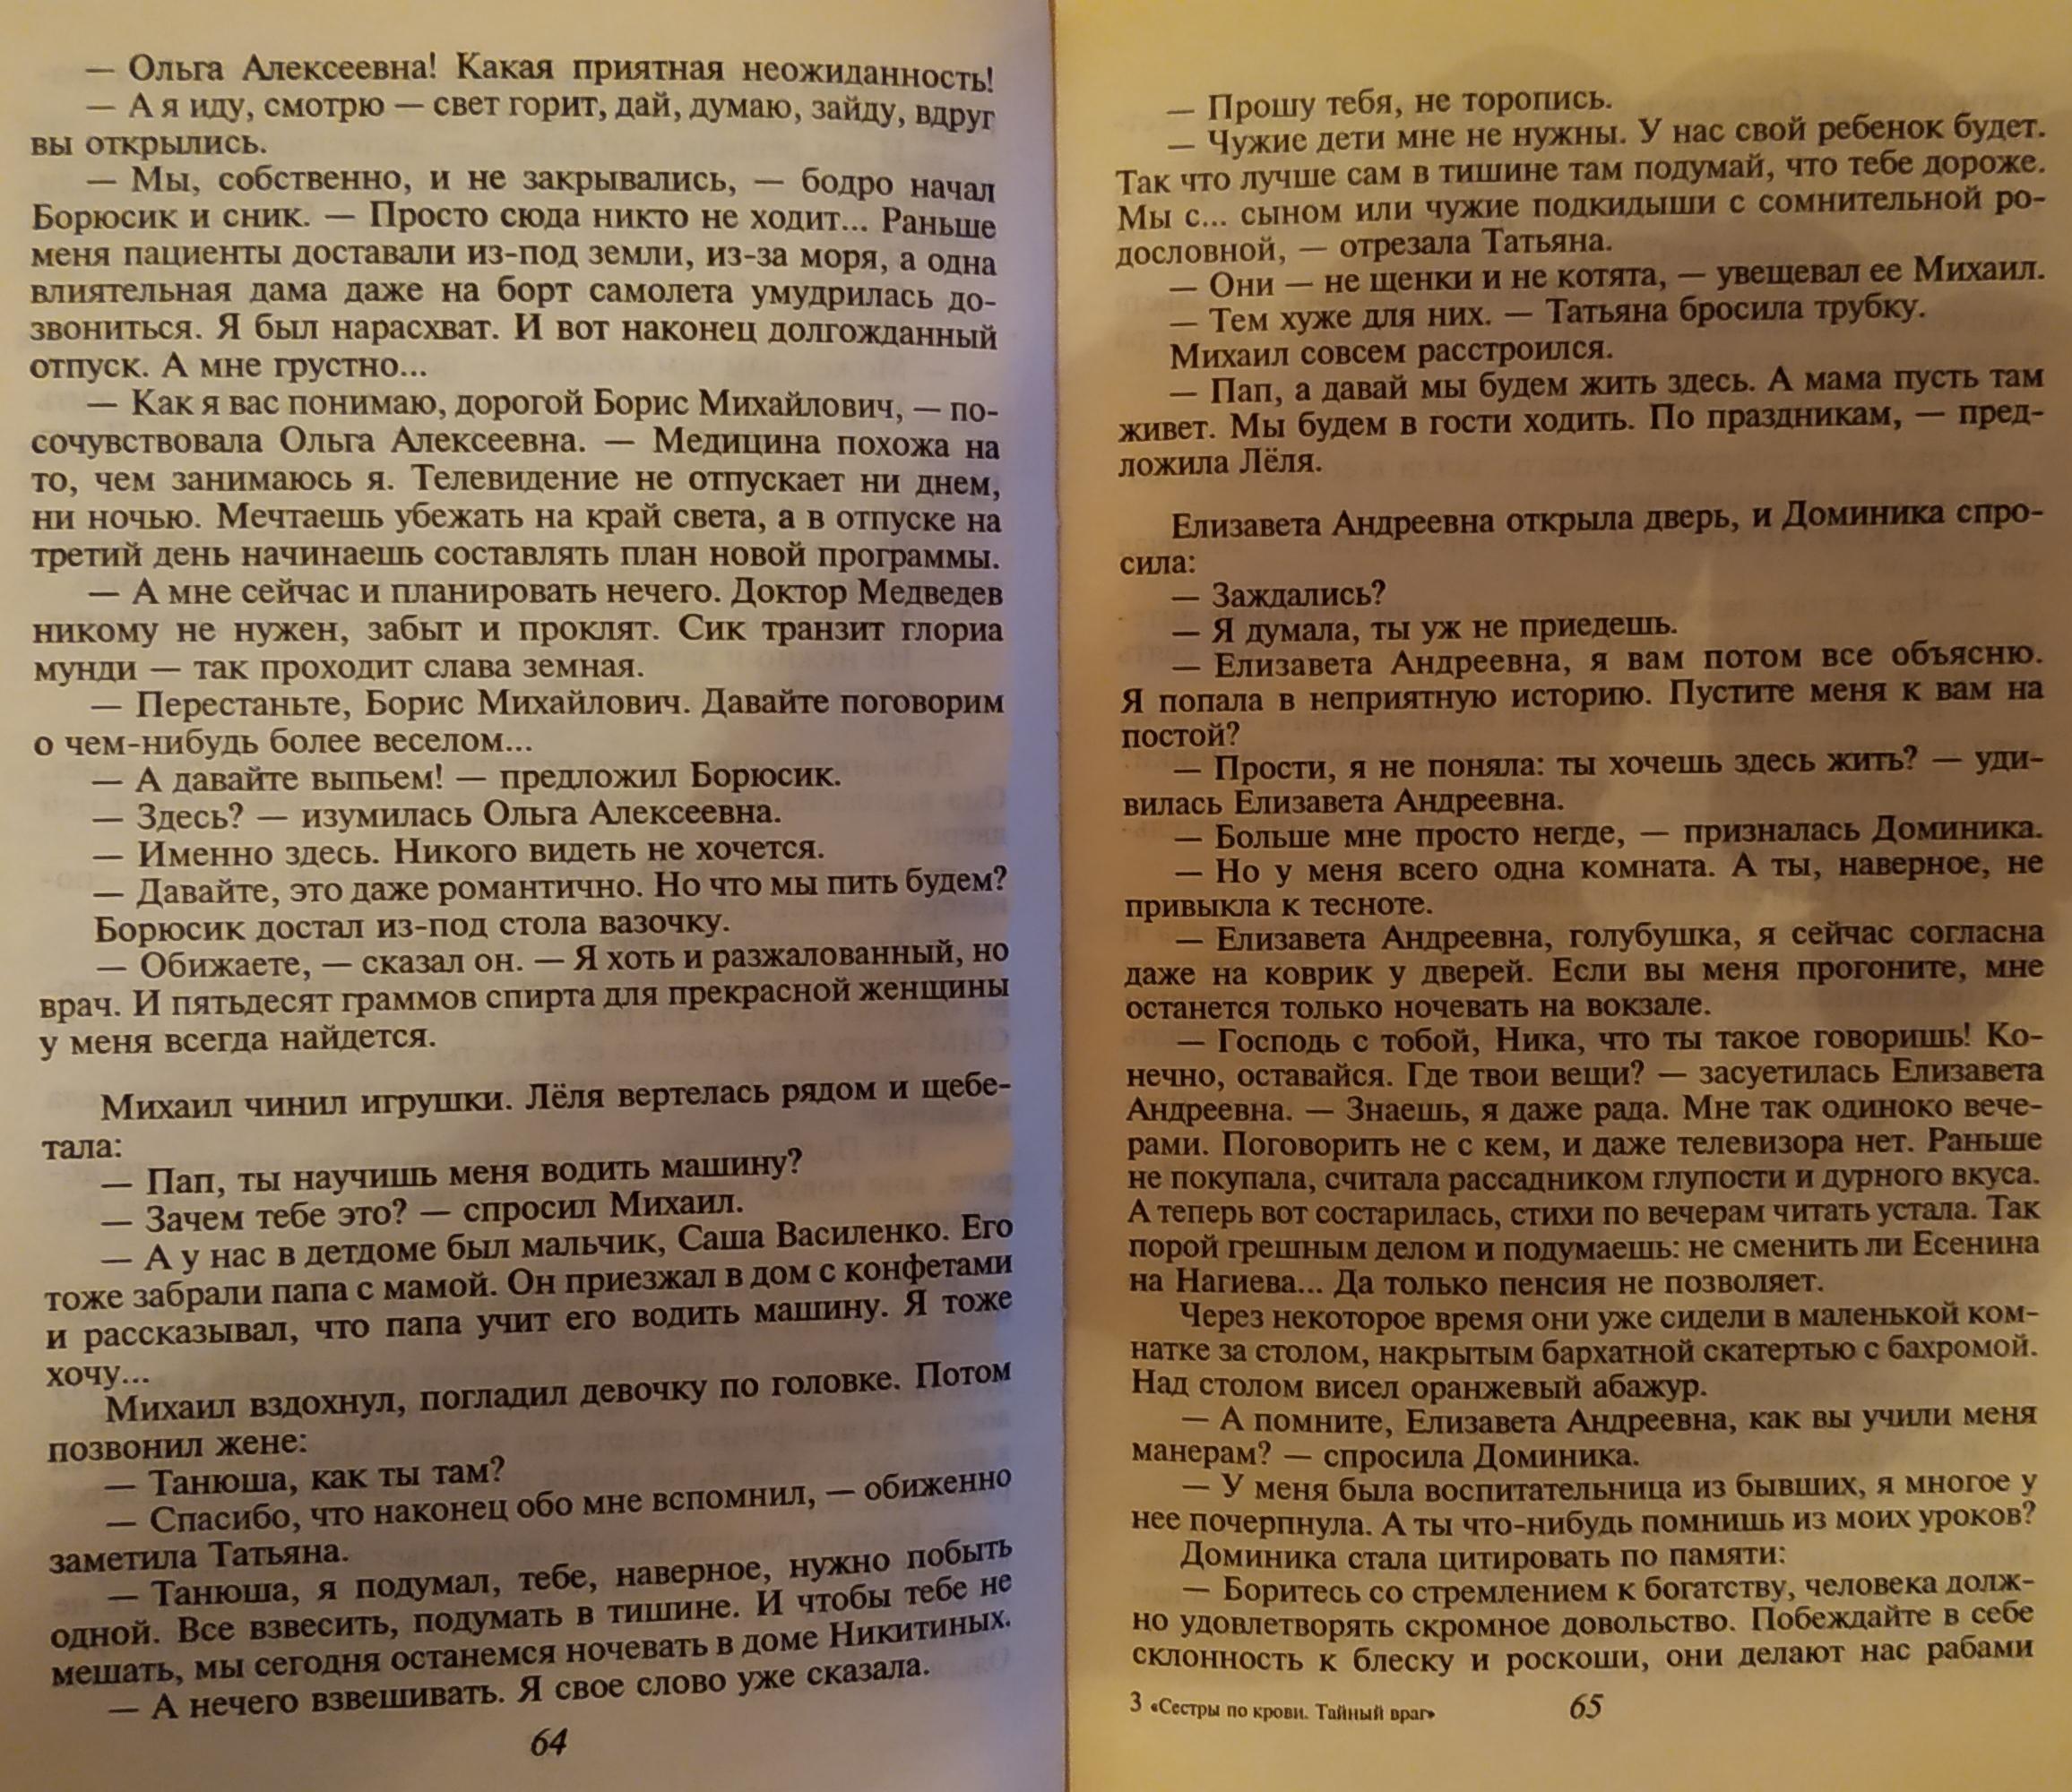 http://s5.uploads.ru/kOXsc.jpg